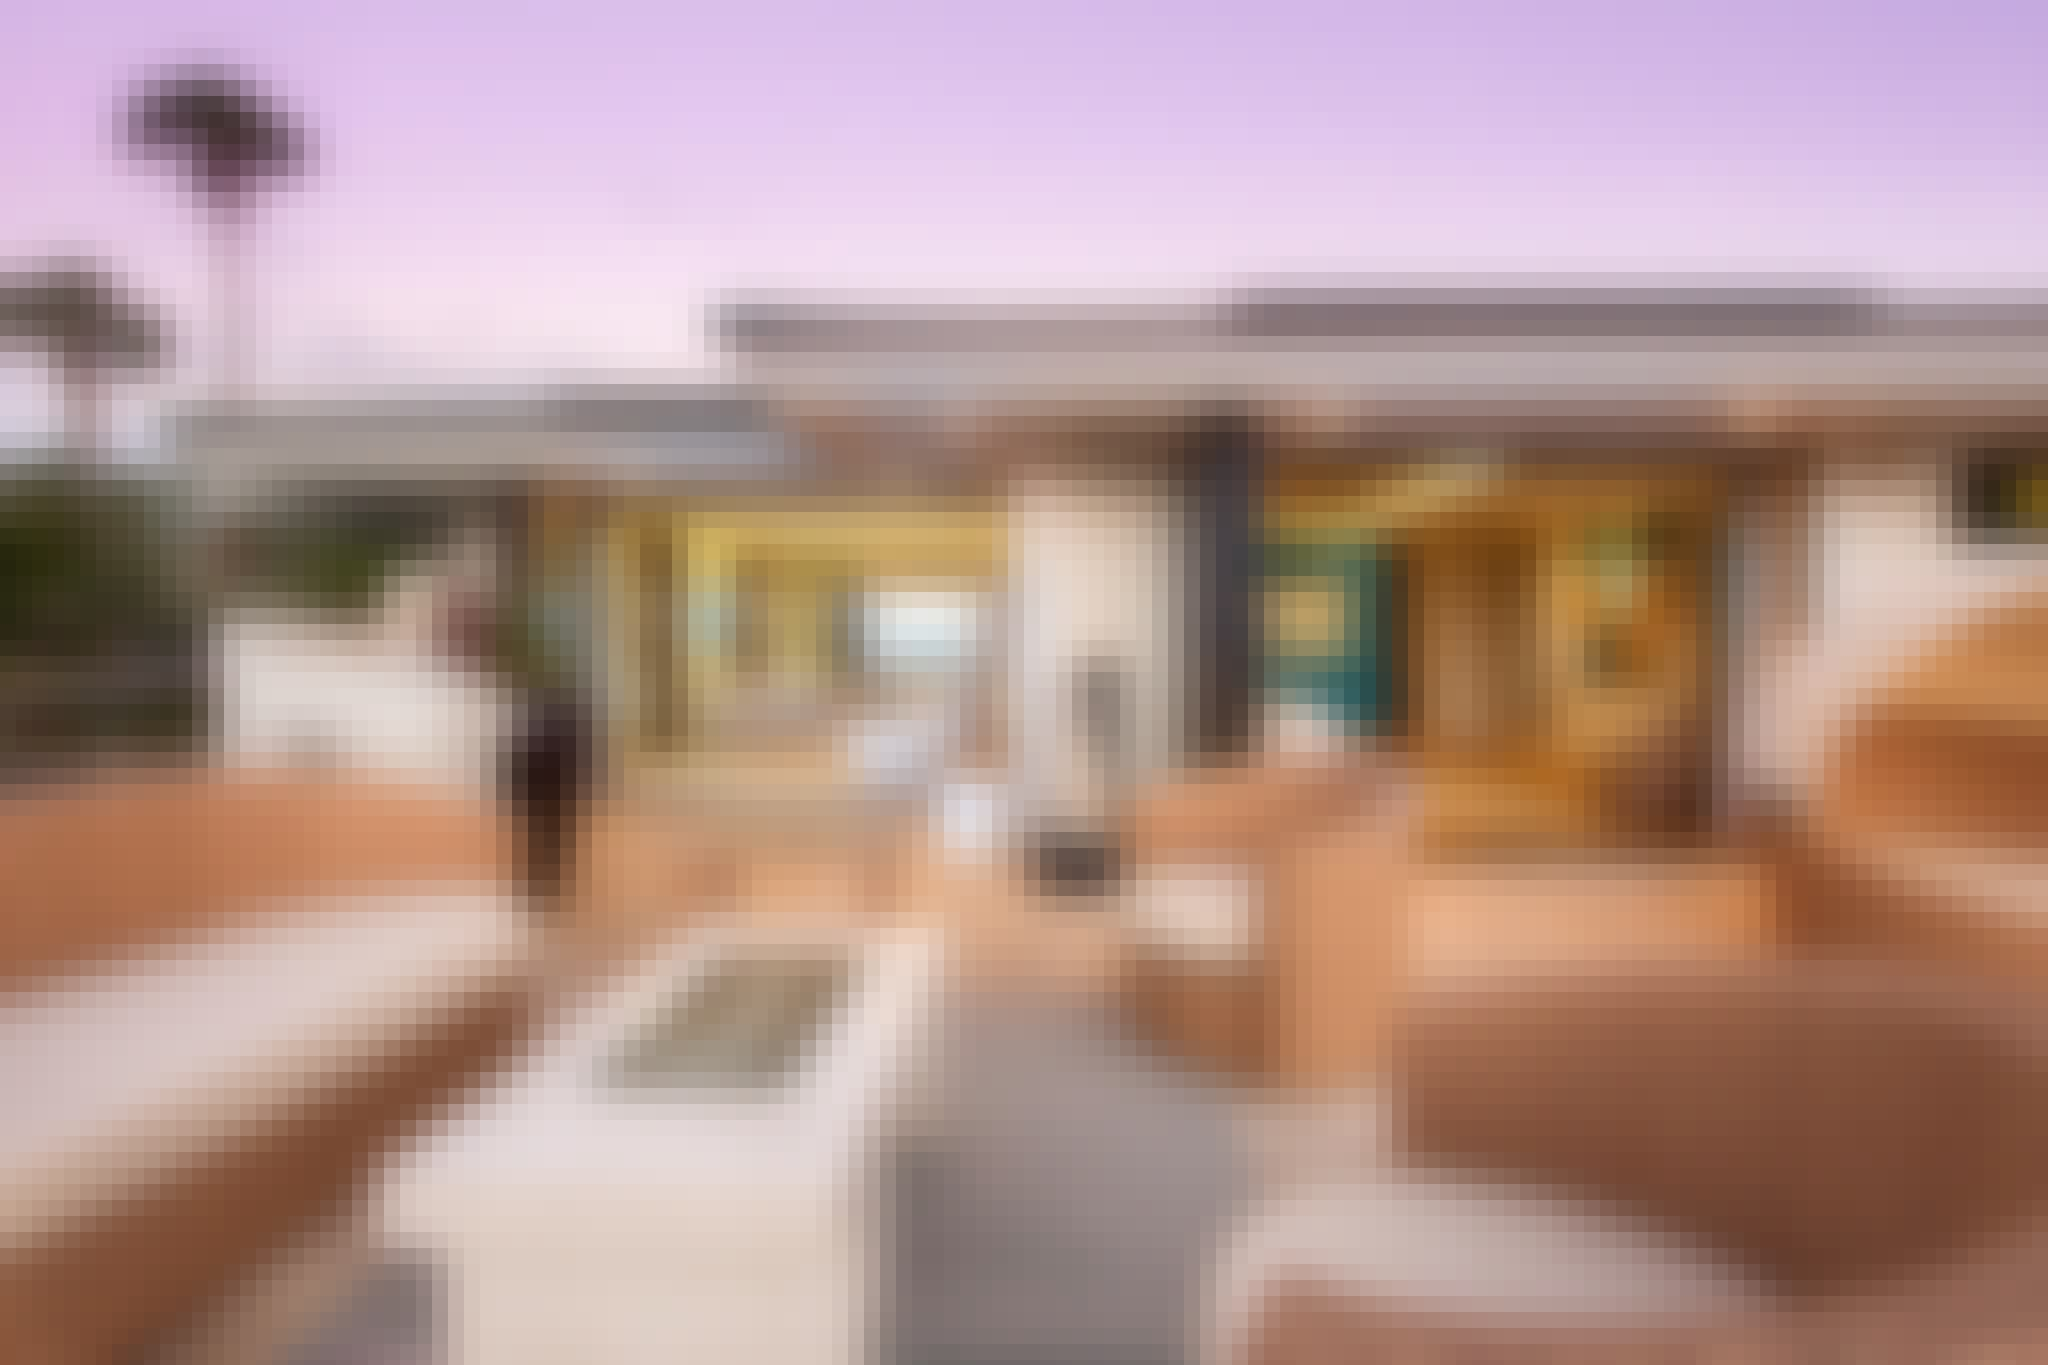 retractable glass walls in vacation rental